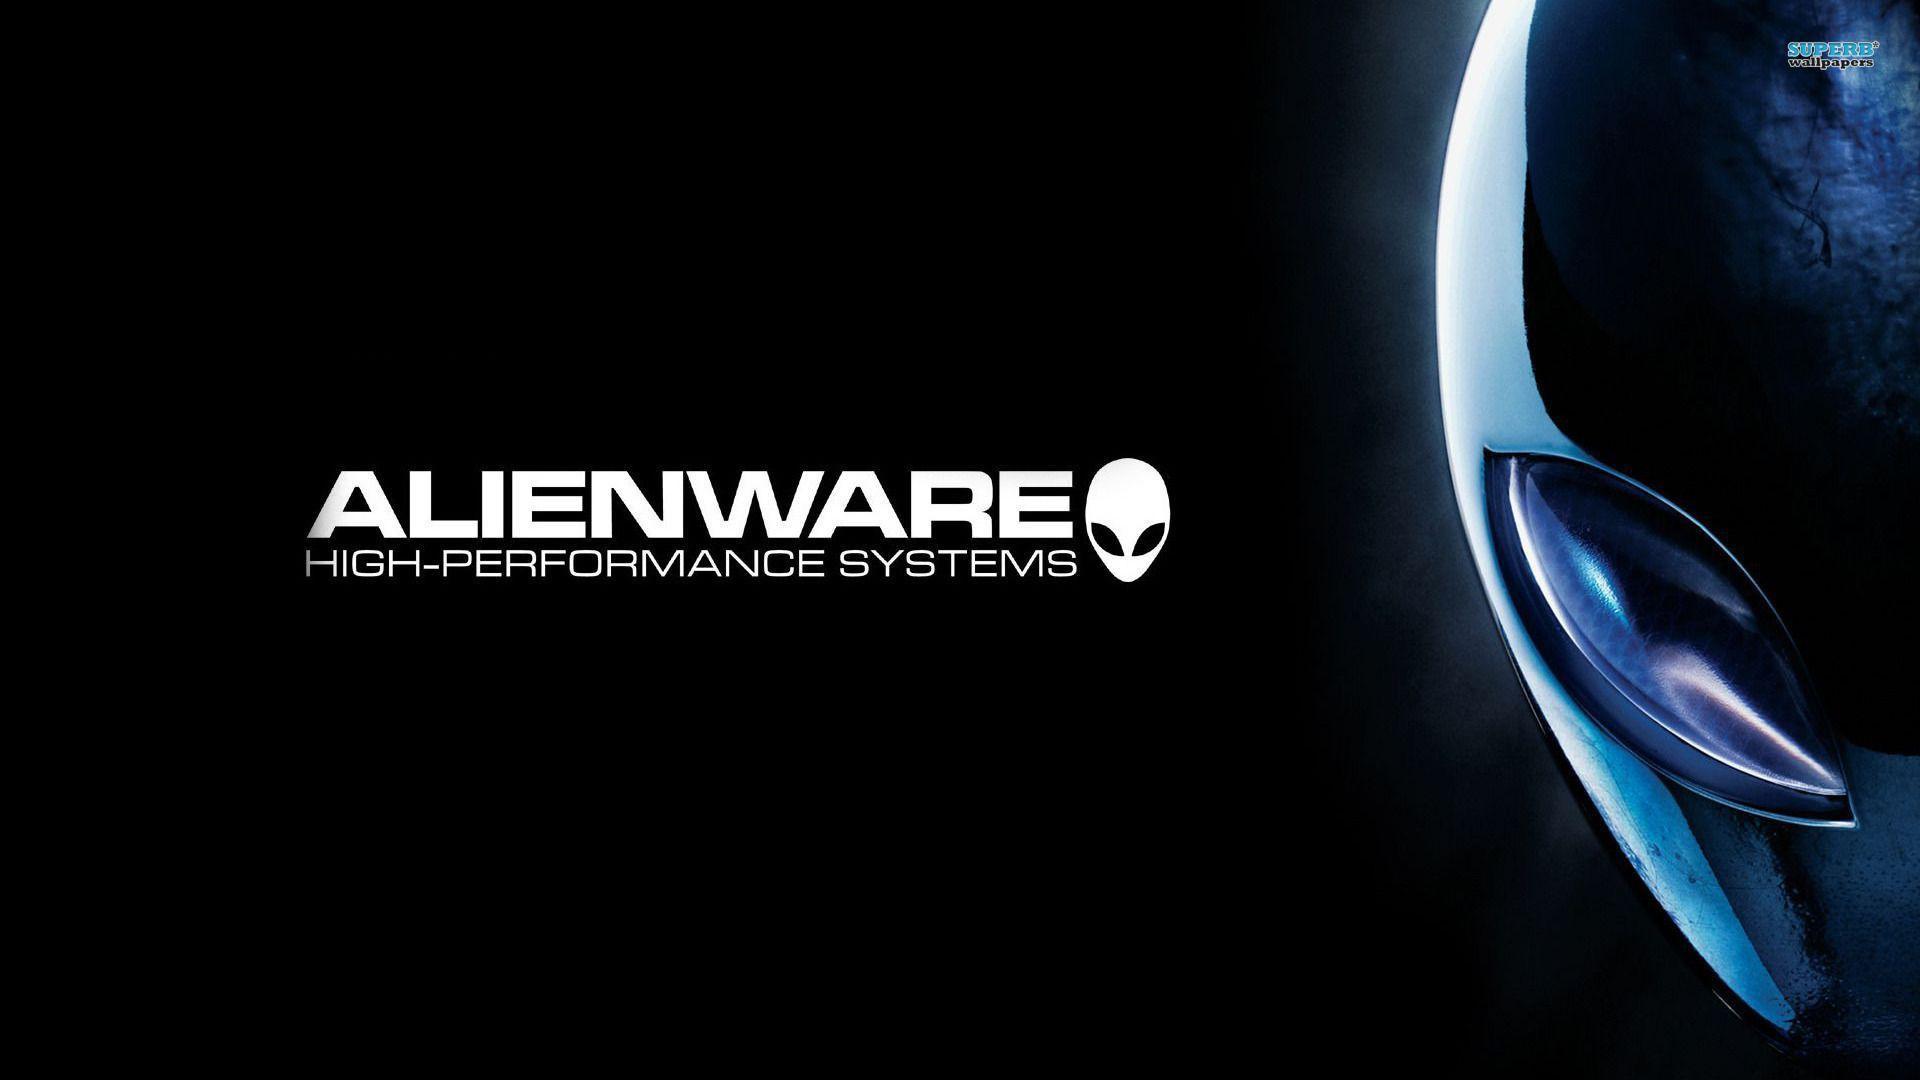 Super Alienware Wallpapers 1920x1080 - Wallpaper Cave &IY_36